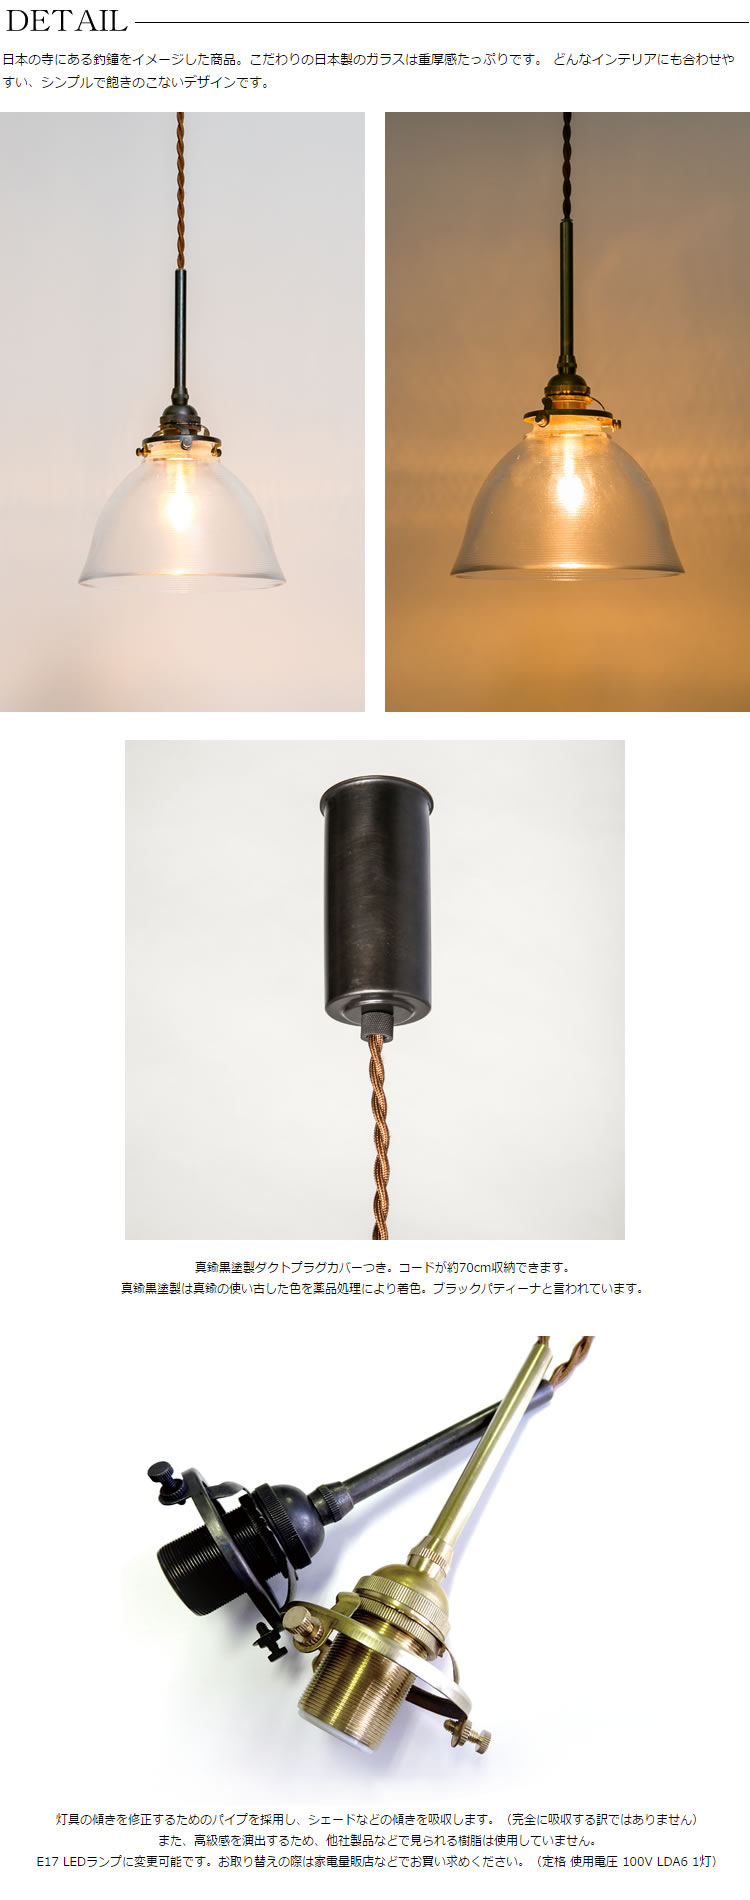 TSURIGANE(ガラス・ダクト・真鍮黒染)